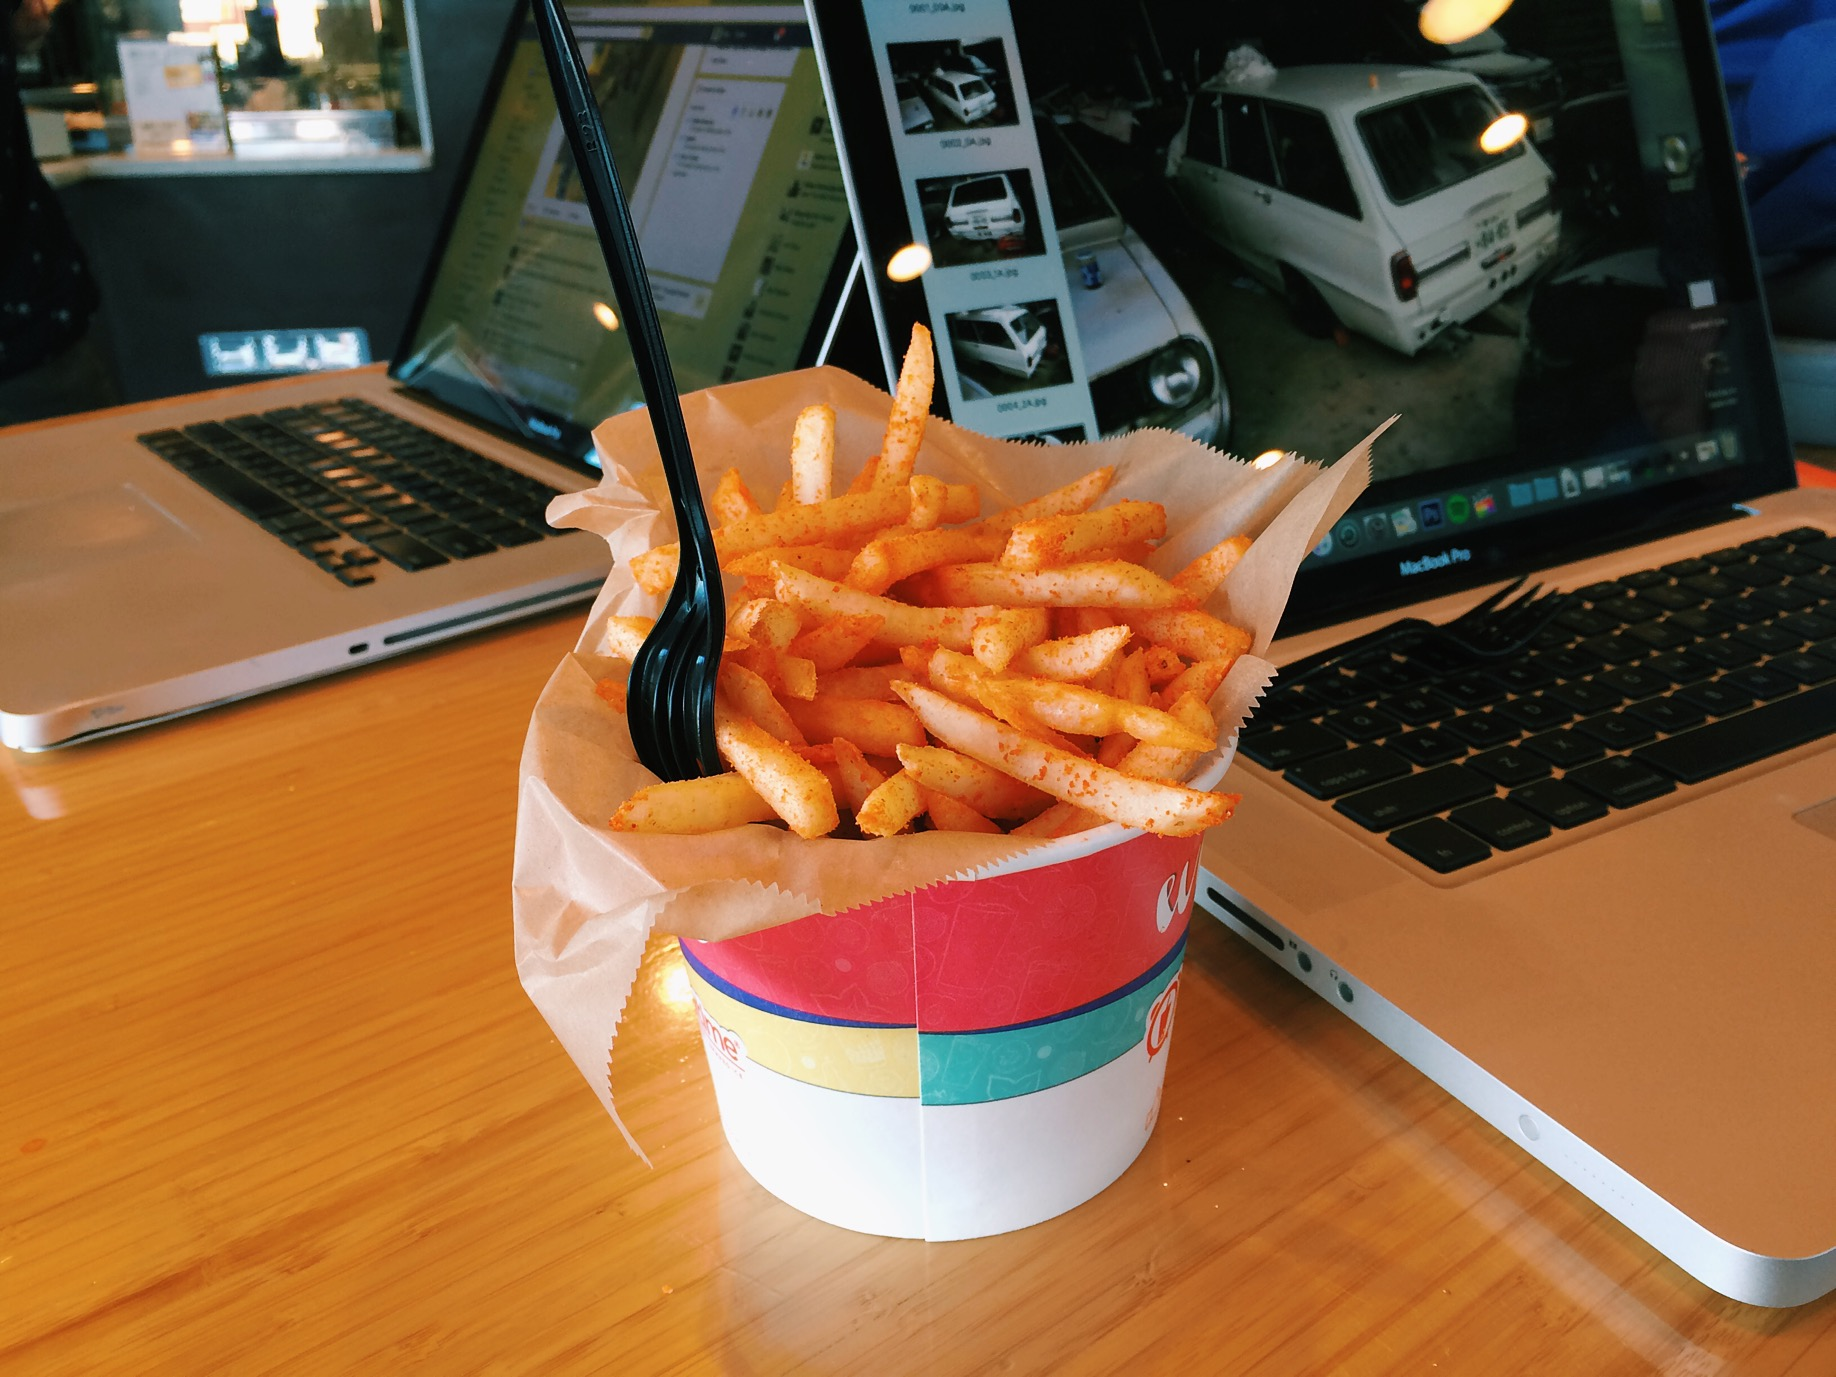 Wild Buffalo Fries, taste pretty good. Munchies food for sure.